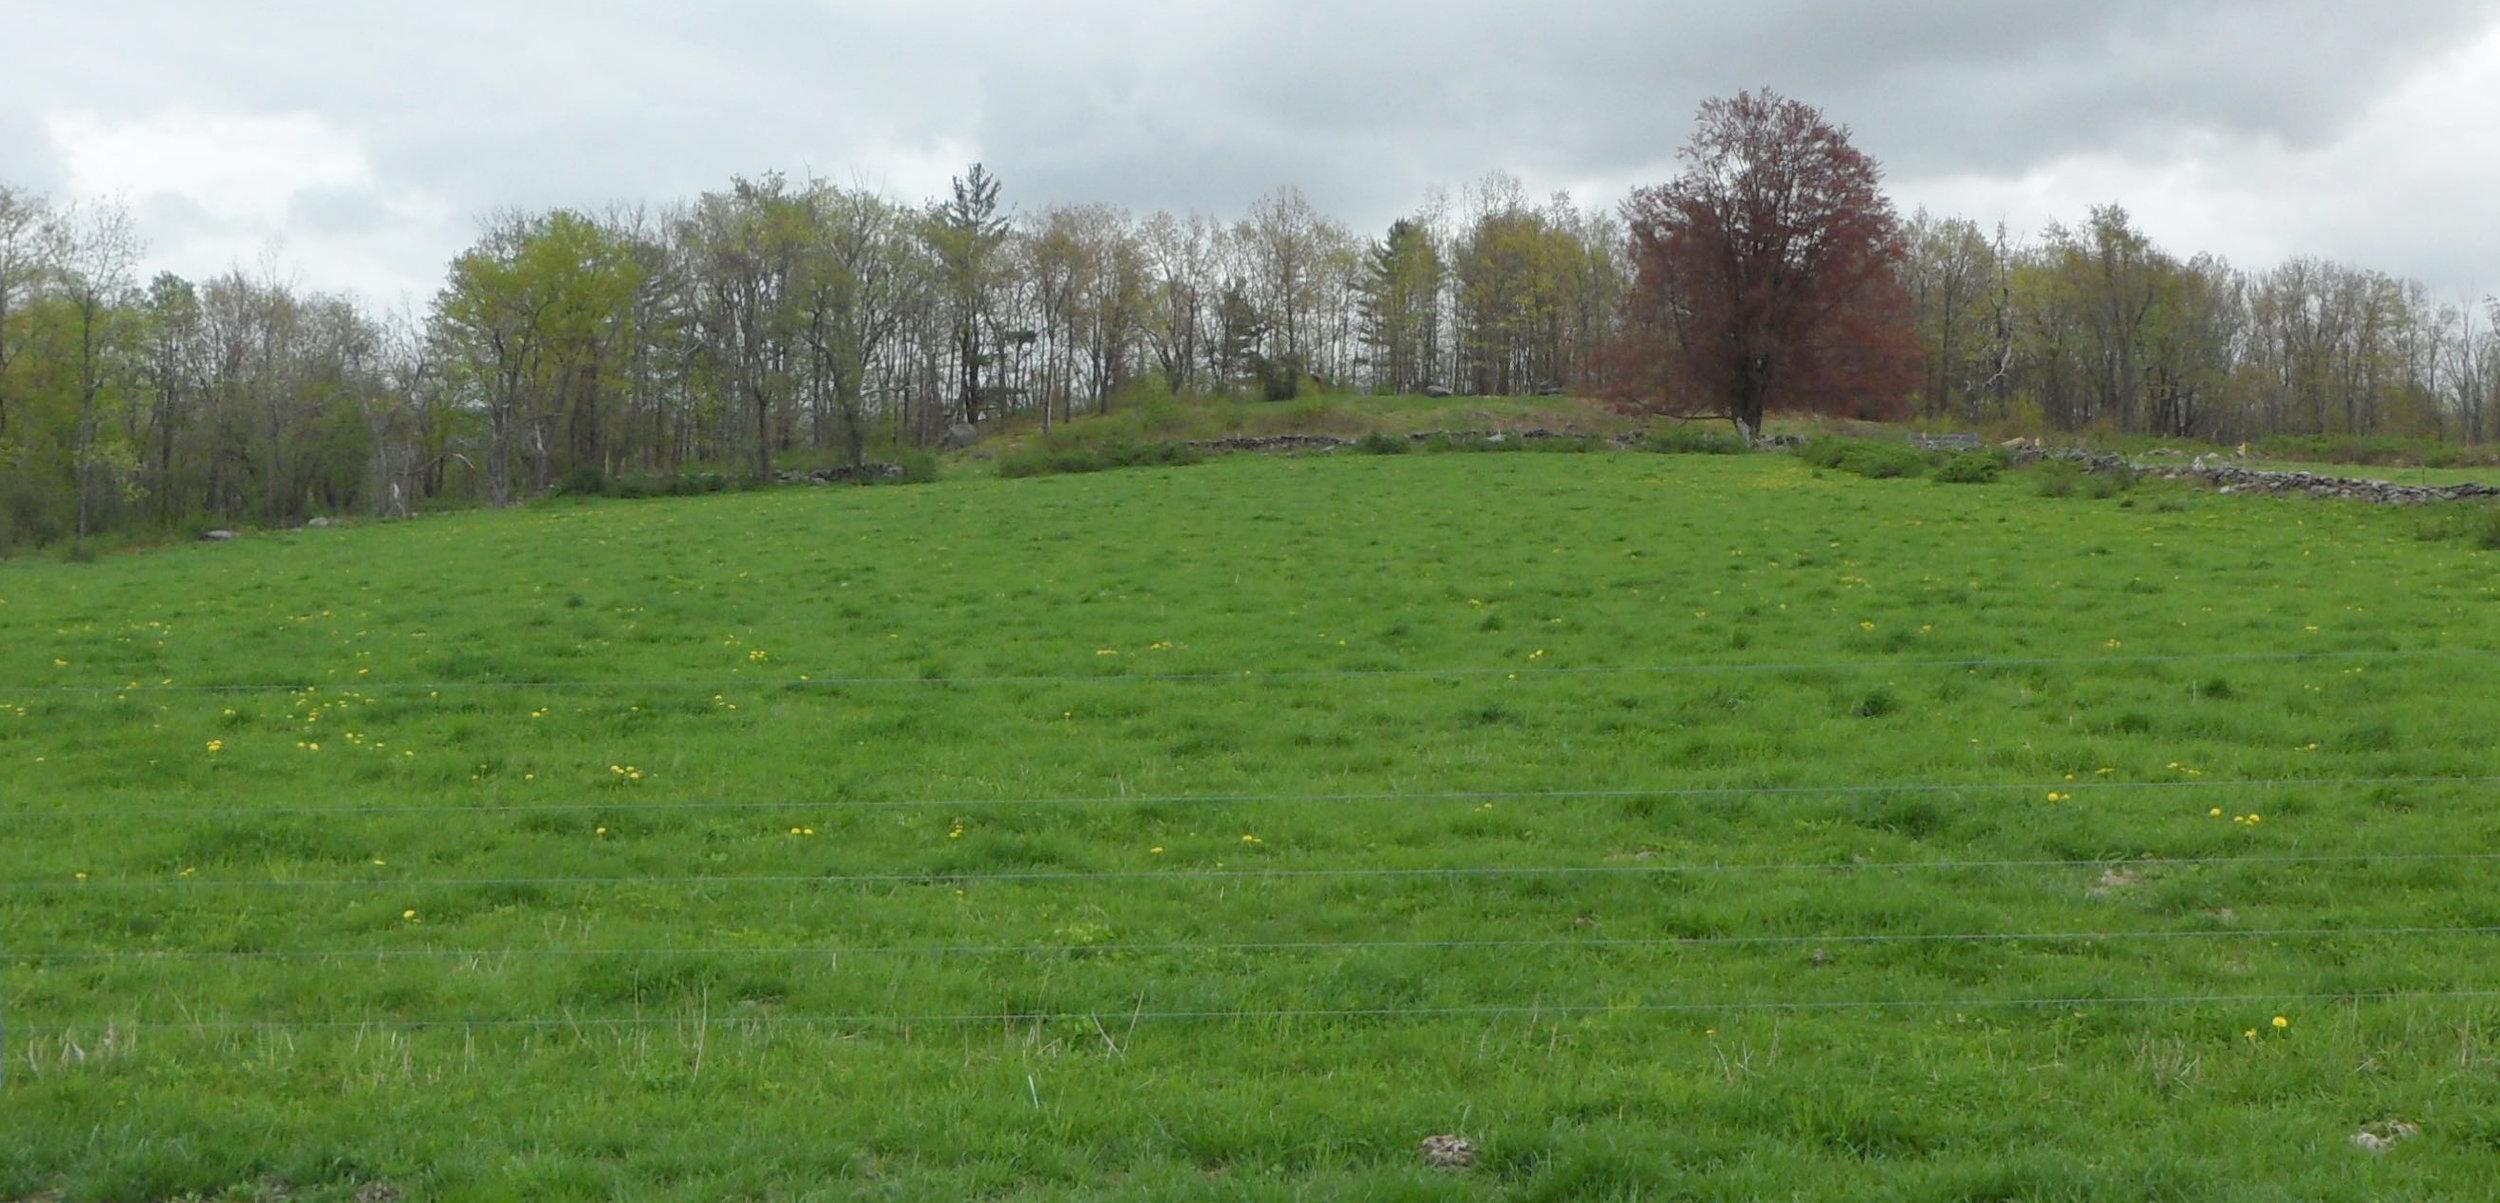 Spring pasture, Hardwick, Massachusetts